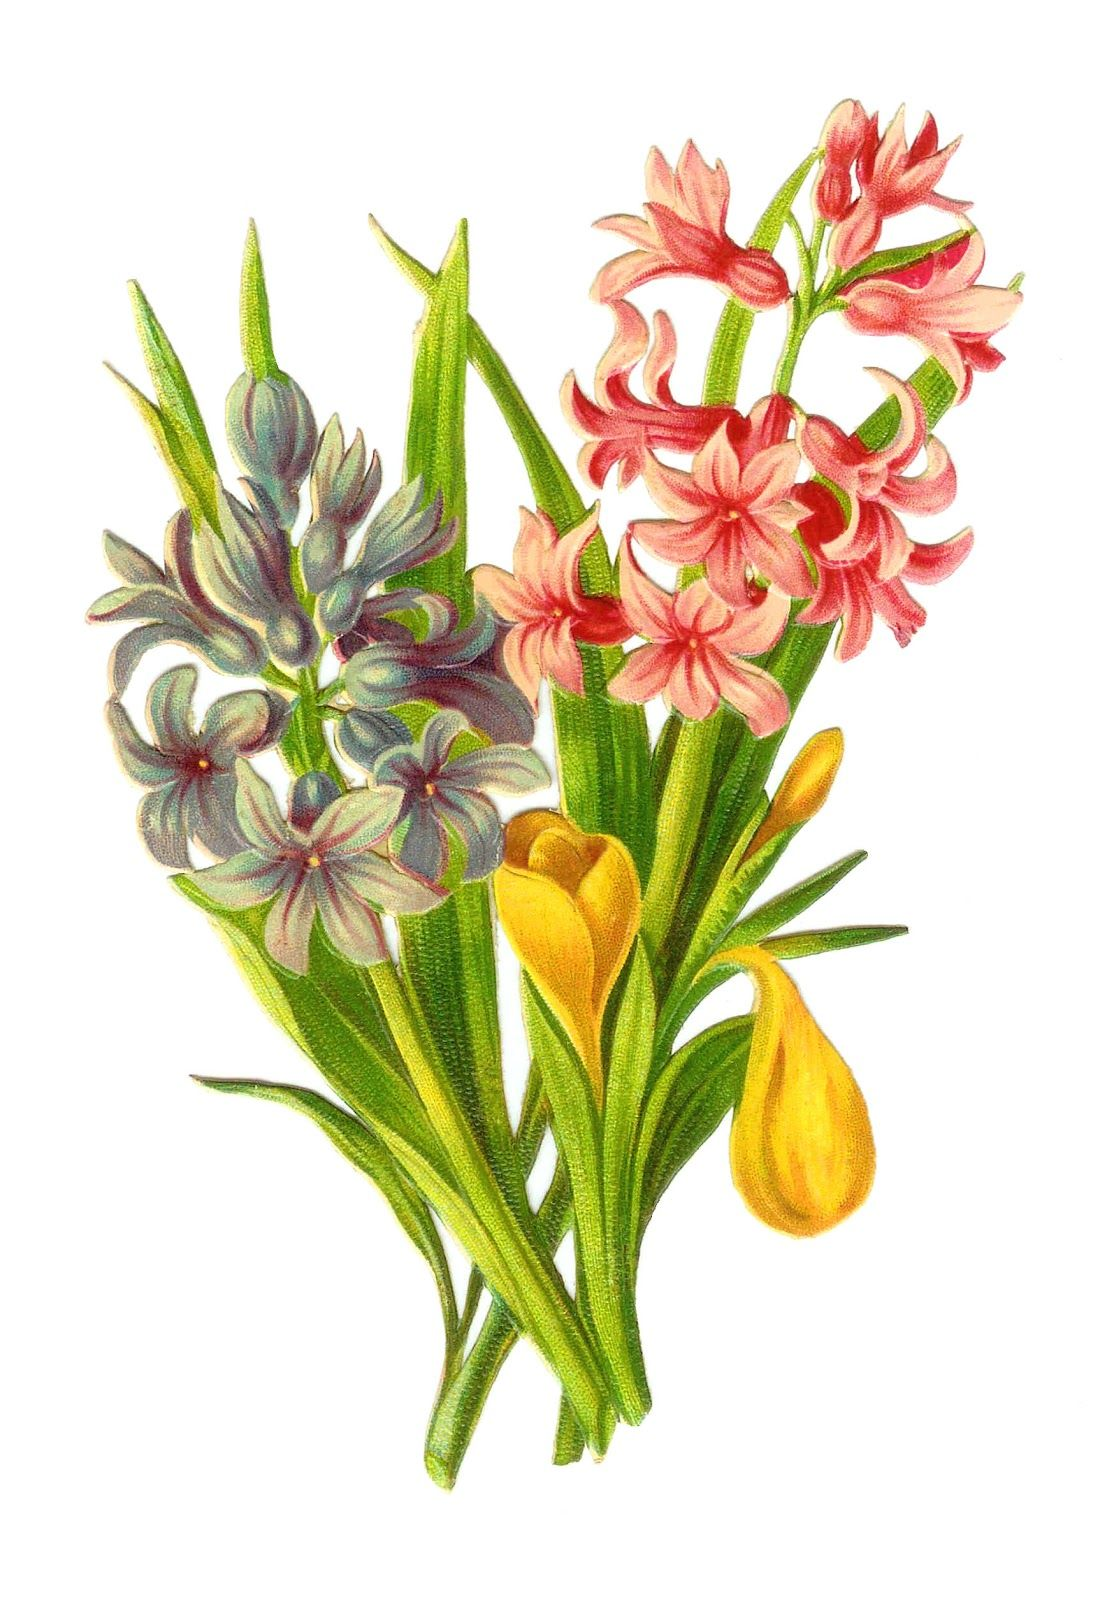 http 2 bp blogspot com c igi ylxiq t zhuxmcf9i aaaaaaaacas rh pinterest com vintage flowers clip art images vintage flower clipart png